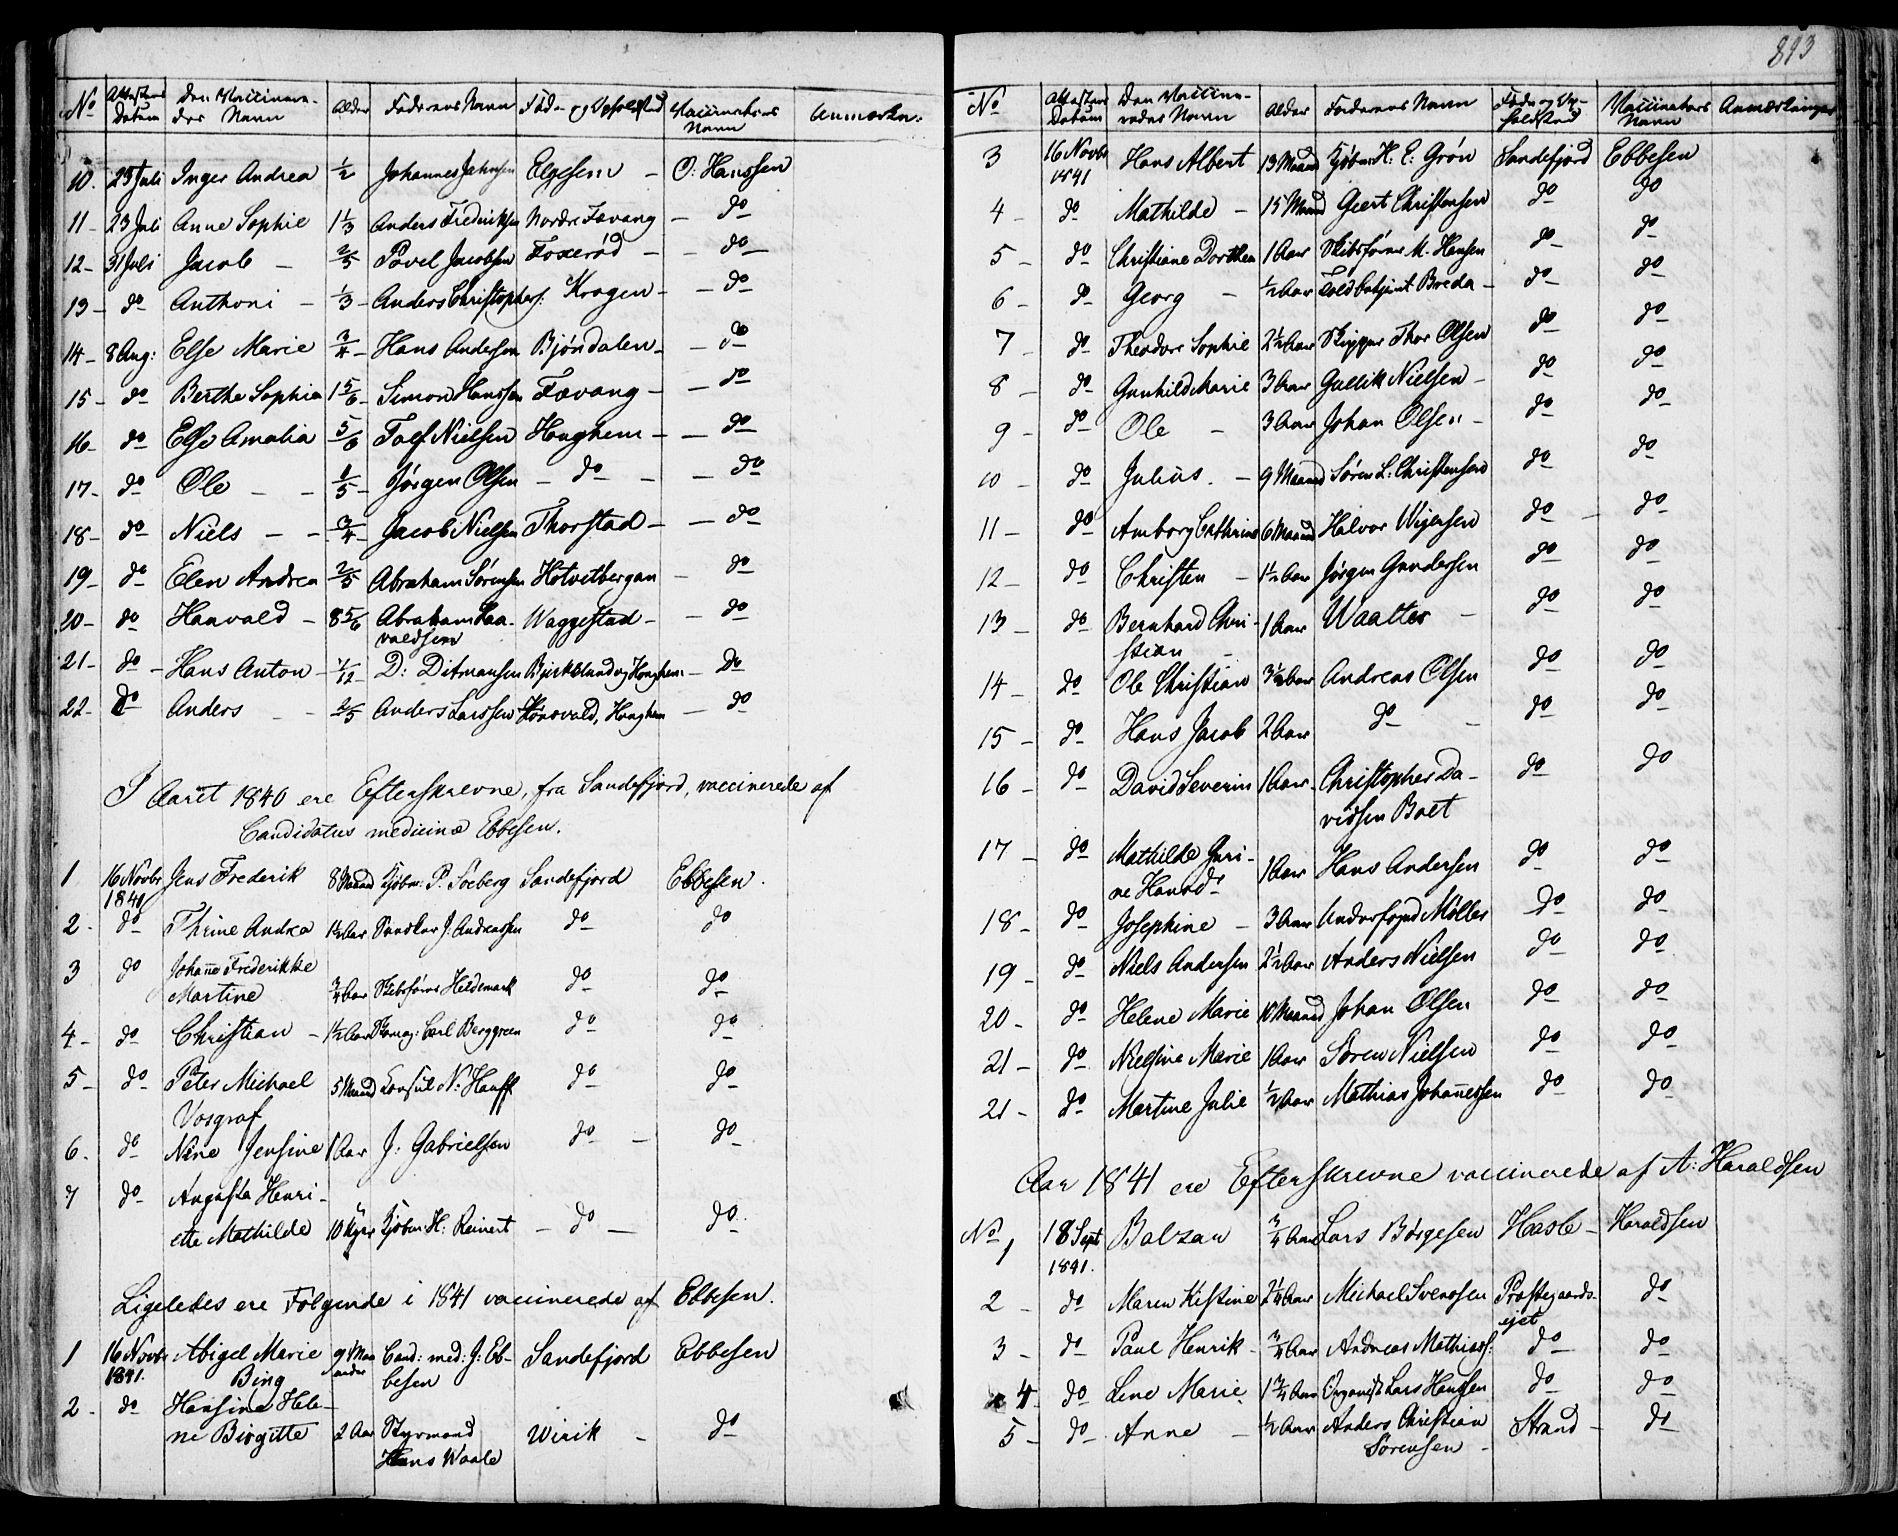 SAKO, Sandar kirkebøker, F/Fa/L0005: Parish register (official) no. 5, 1832-1847, p. 892-893